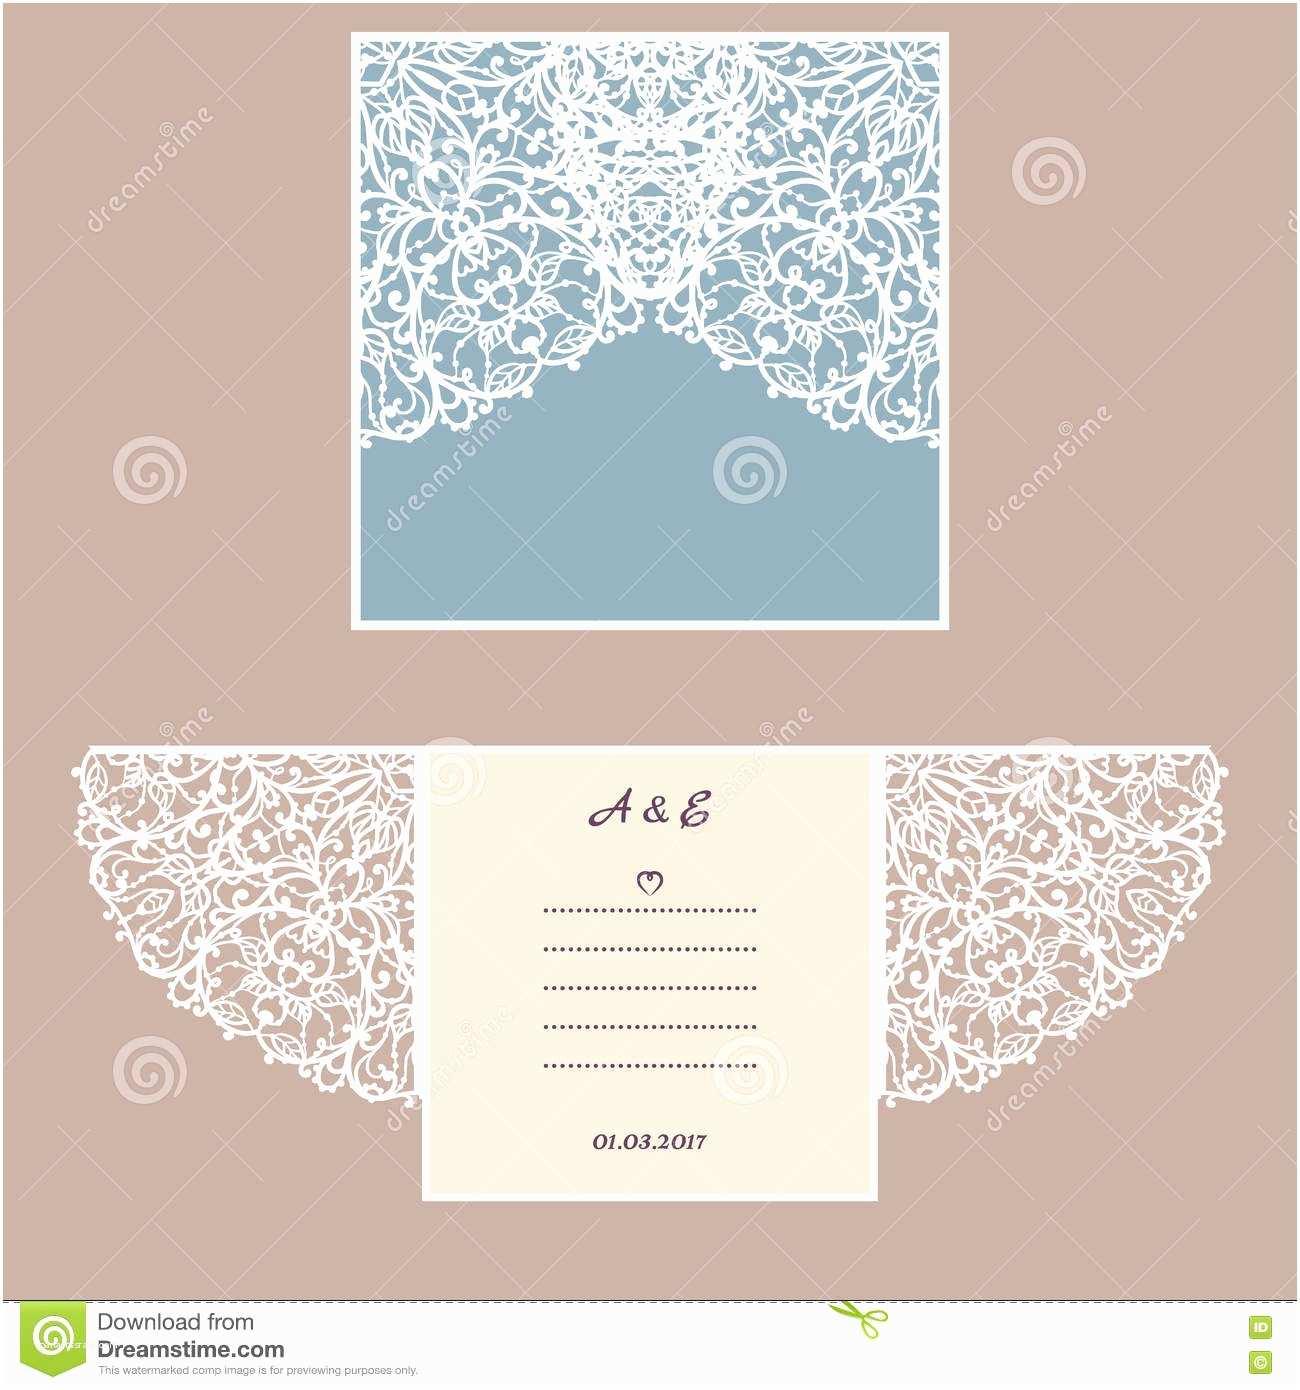 Wedding Invitation Envelope Template Laser Cut Envelope Template for Invitation Wedding Card